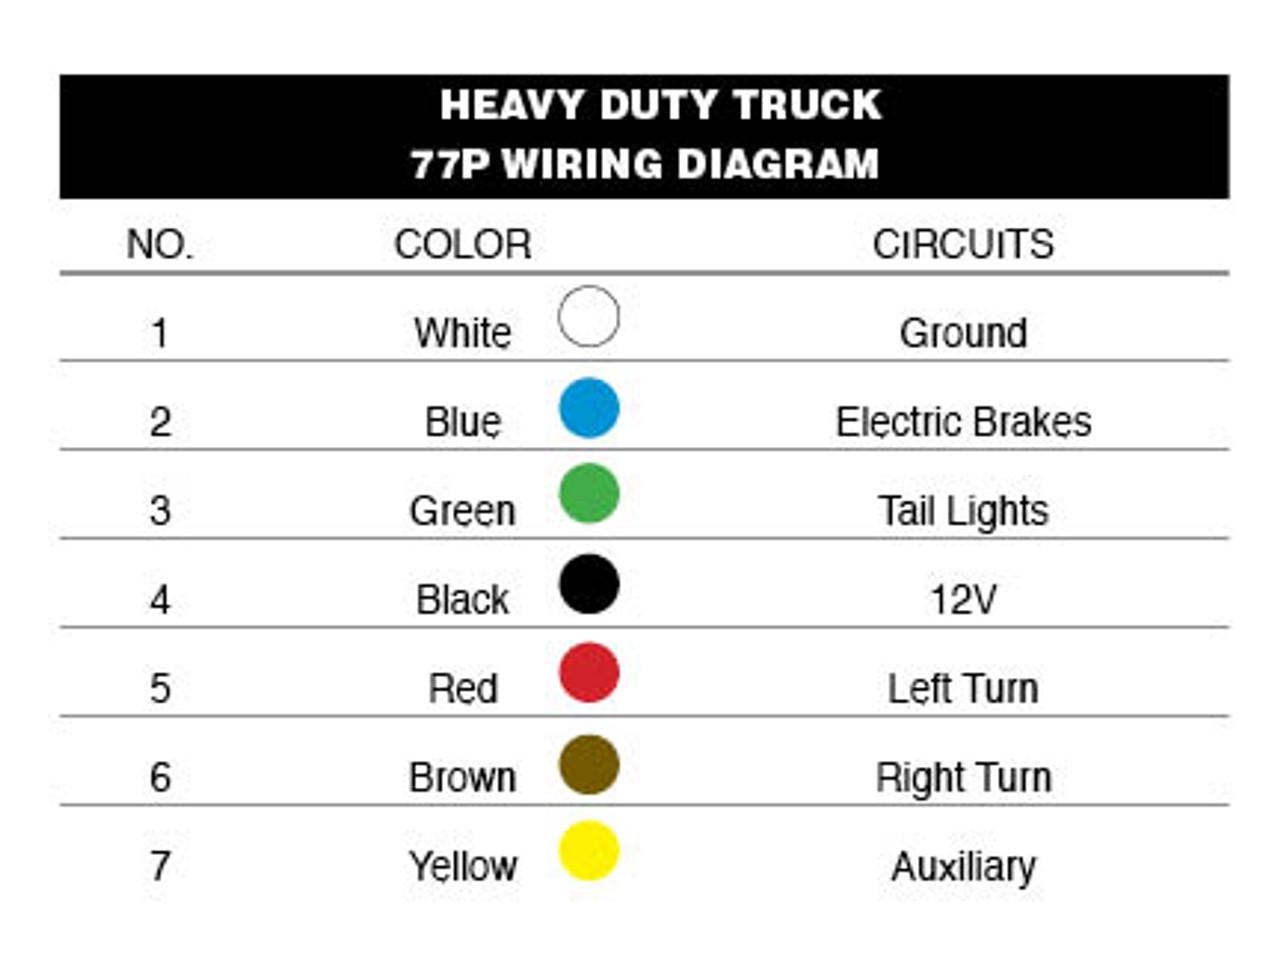 77PW/87S --- 7-Way Flat Pin to 7-Way Round Pin Adapter